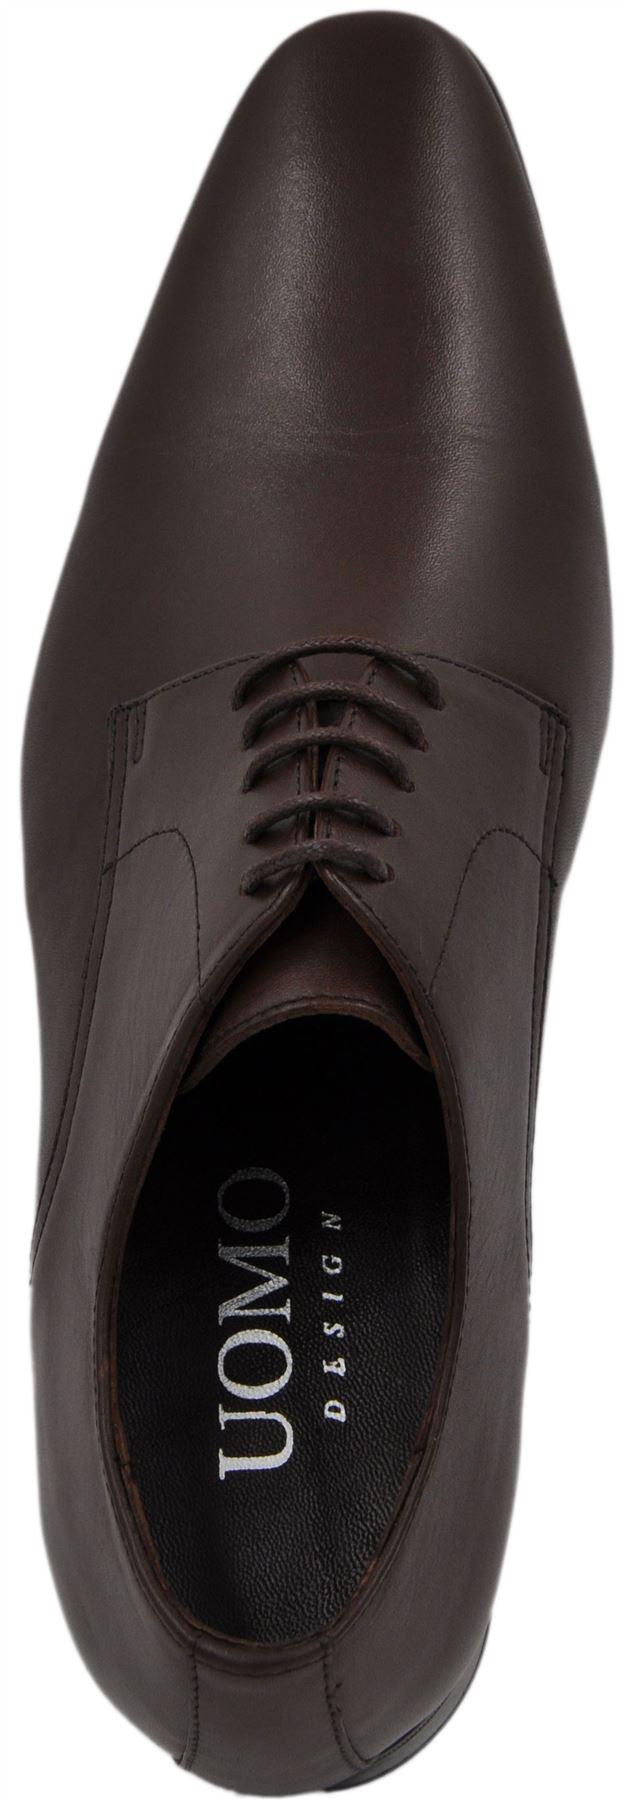 Richelieu 100% cuir à lacets San Paulo 1454_marron Scarpe classiche da uomo